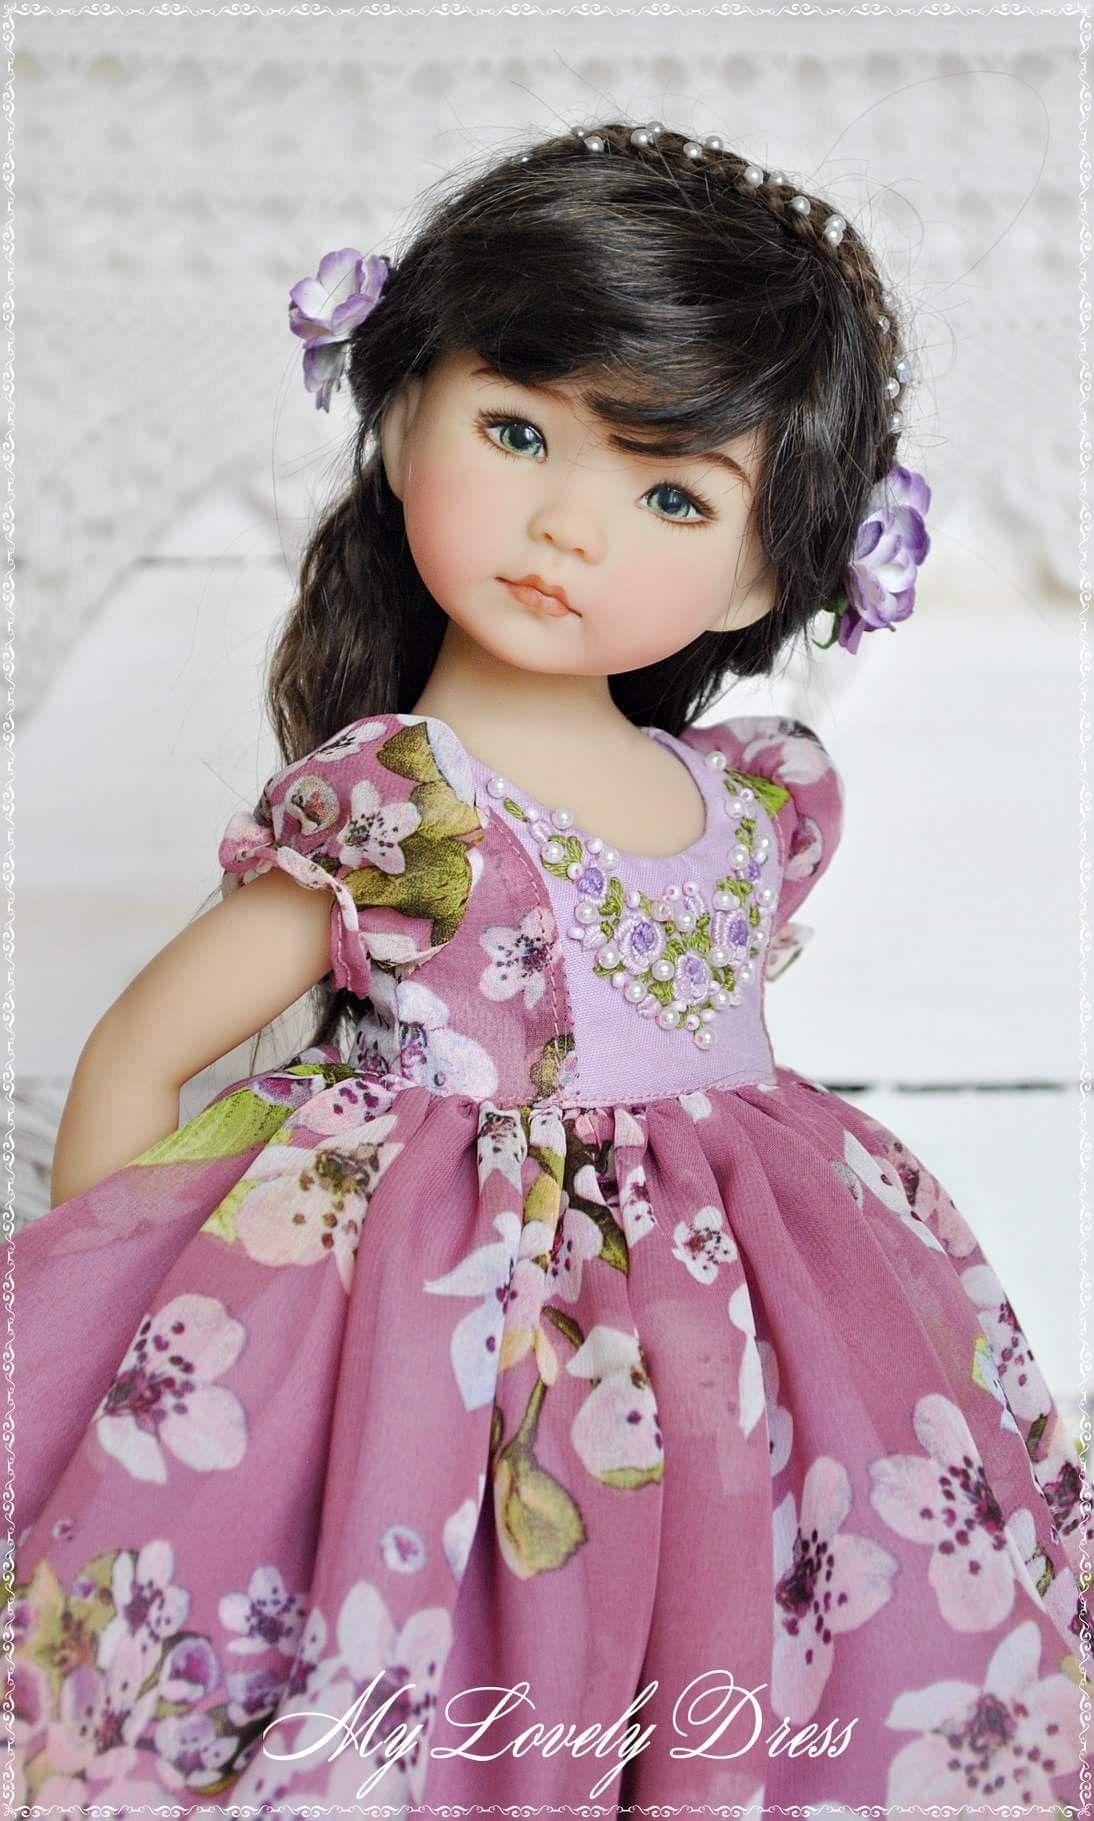 Épinglé par Carole Turman sur American Doll   Pinterest 2ae36eaedaf